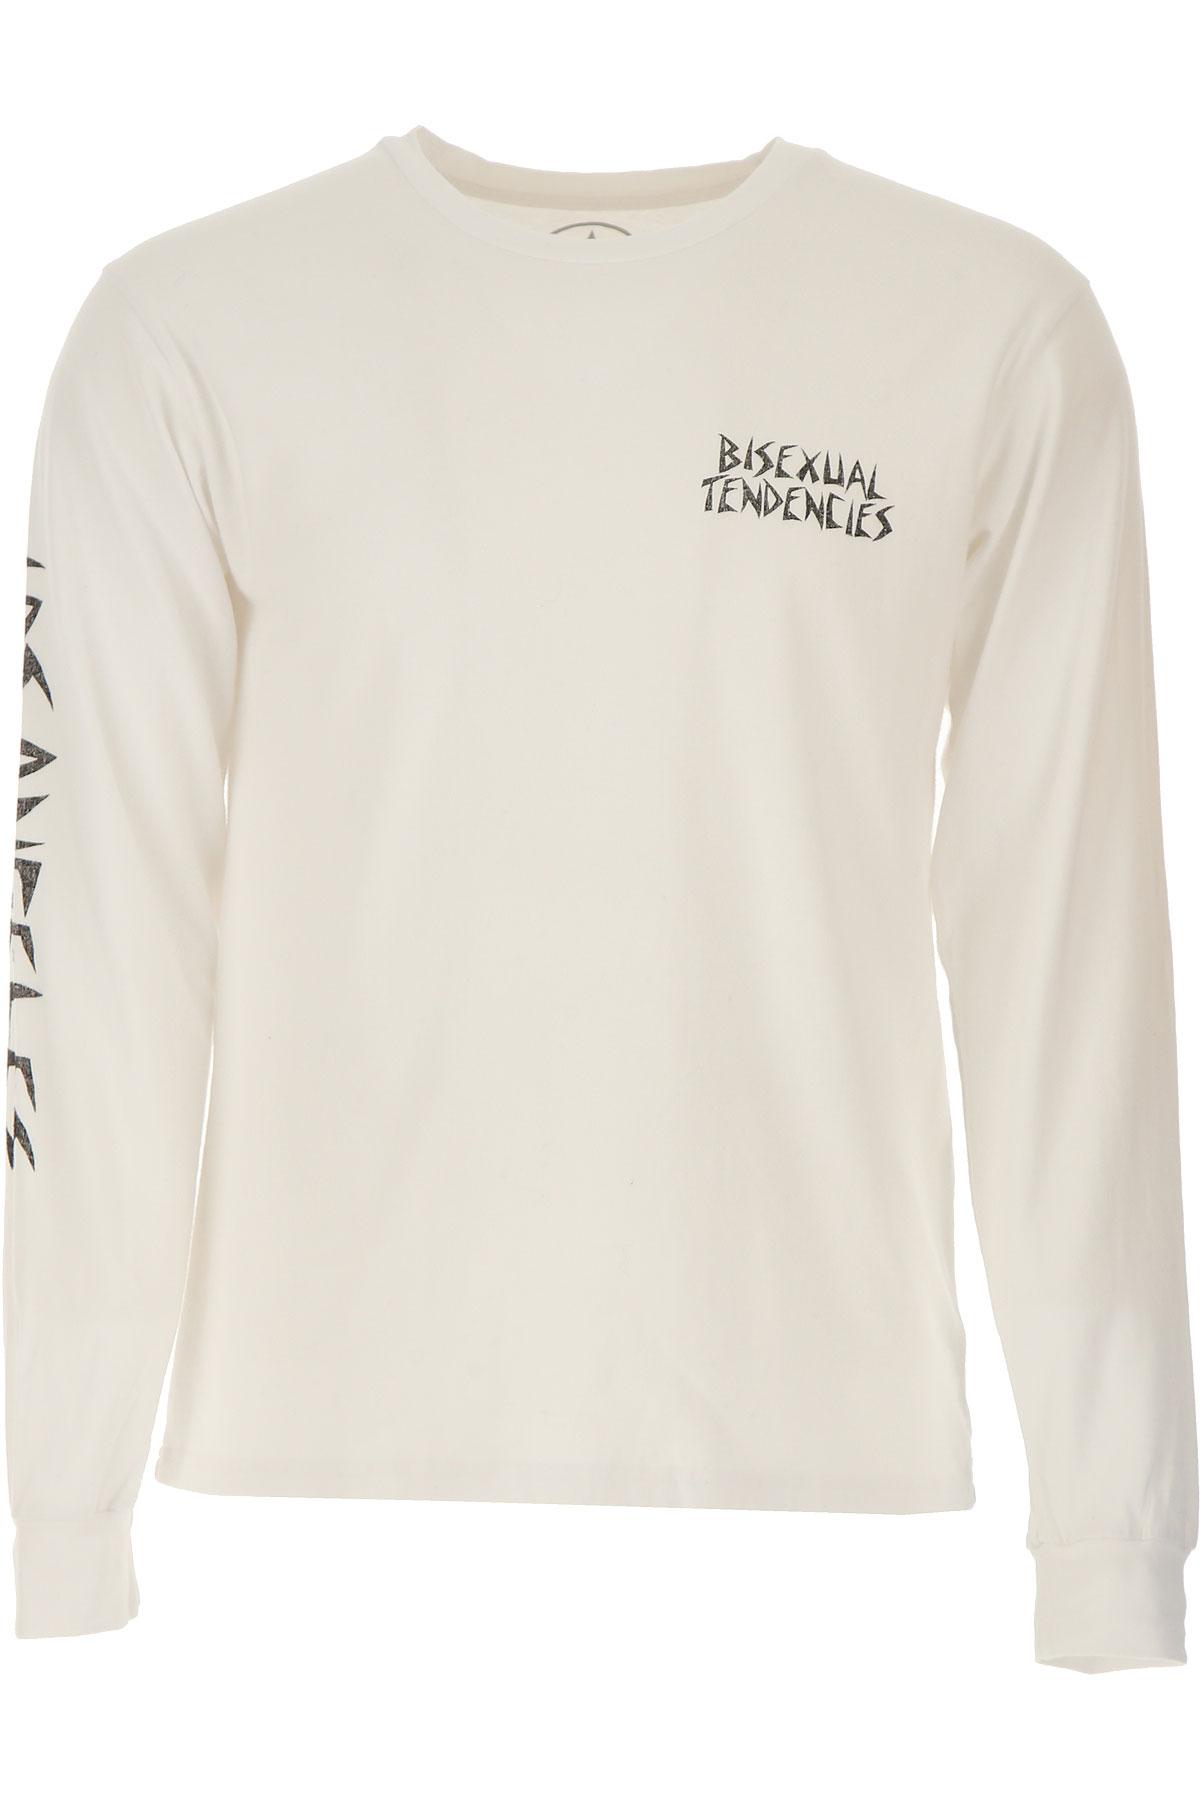 Image of Local Authority T-Shirt for Men, White, Cotton, 2017, 2 - Uk/Usa M - Ita 48 3 - Uk/Usa L - Ita 50 4 - Uk/Usa XL - Ita 52 5 - Uk/Usa XXL - Ita 54